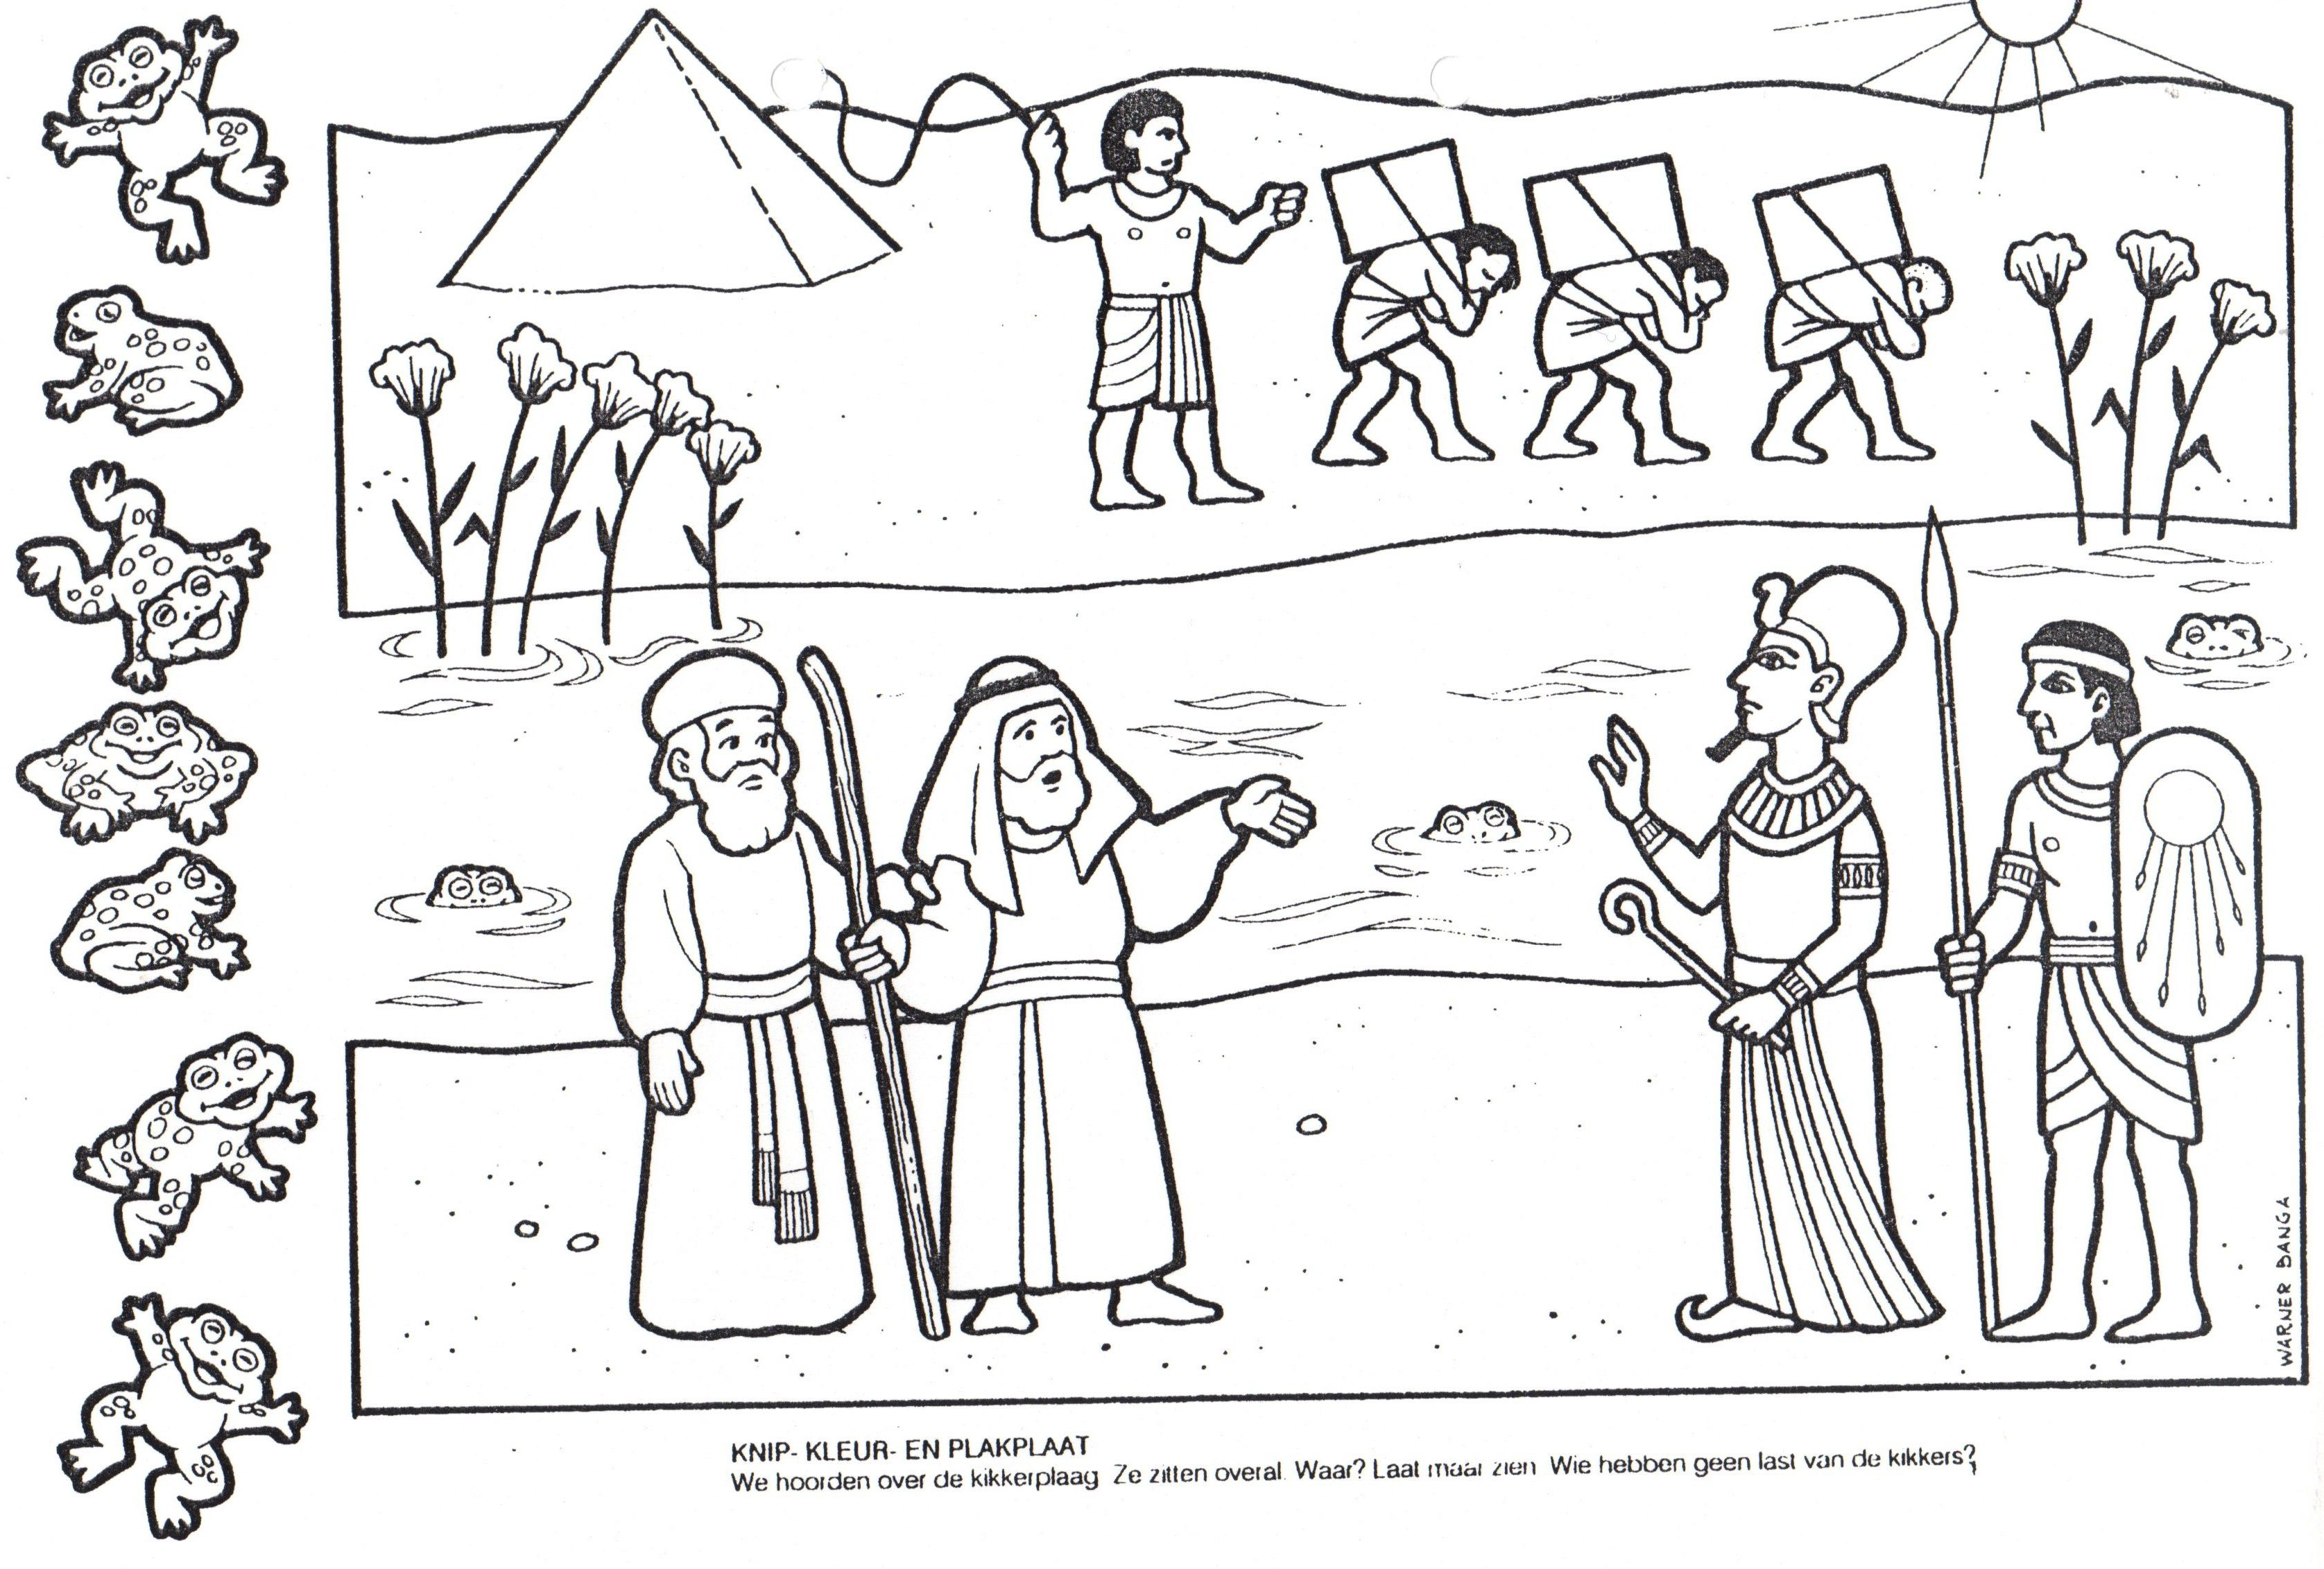 Pin de Svetlana en Bible - Moses | Pinterest | La rana, Ranas y Egipto